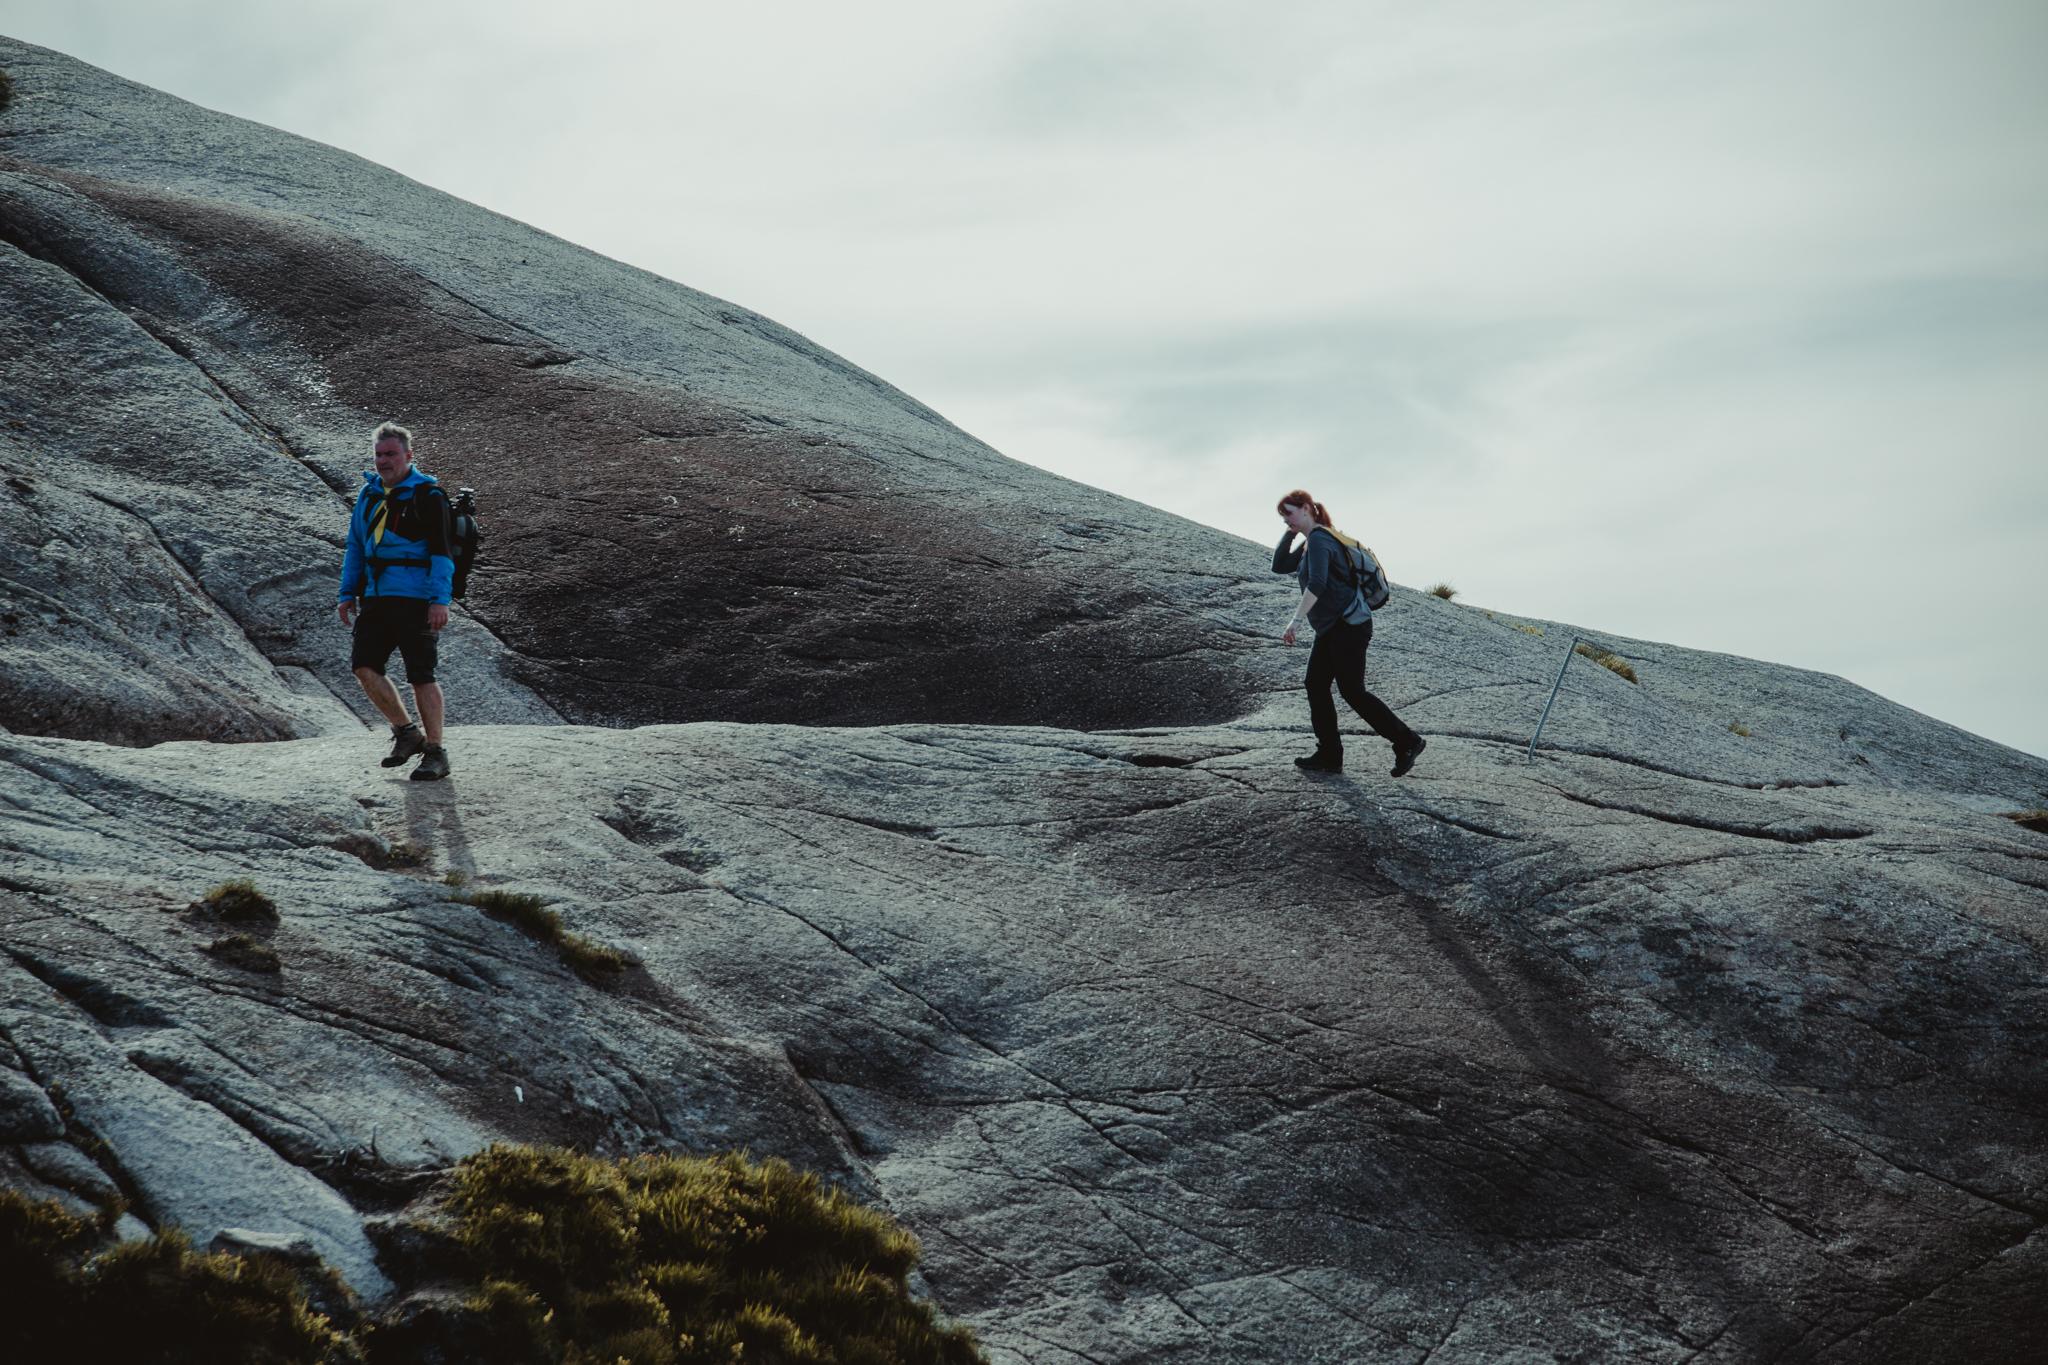 kjerag-szlak-łańcuchy-stromo-norwegia